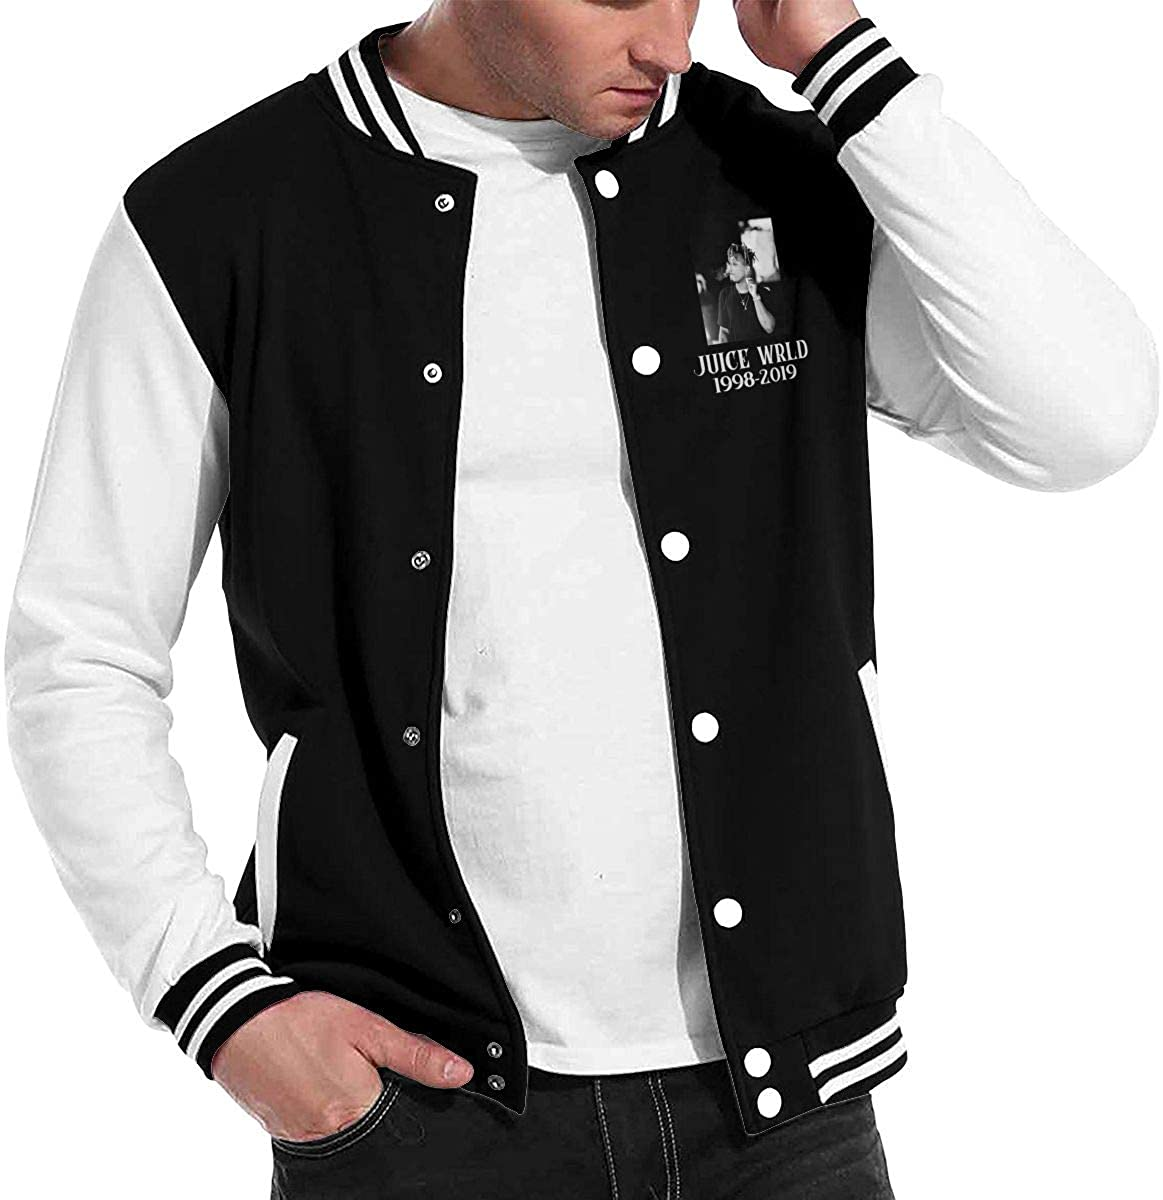 Juice Wrld Women's Mans Vintage Hoodie Baseball Uniform Jacket Sport